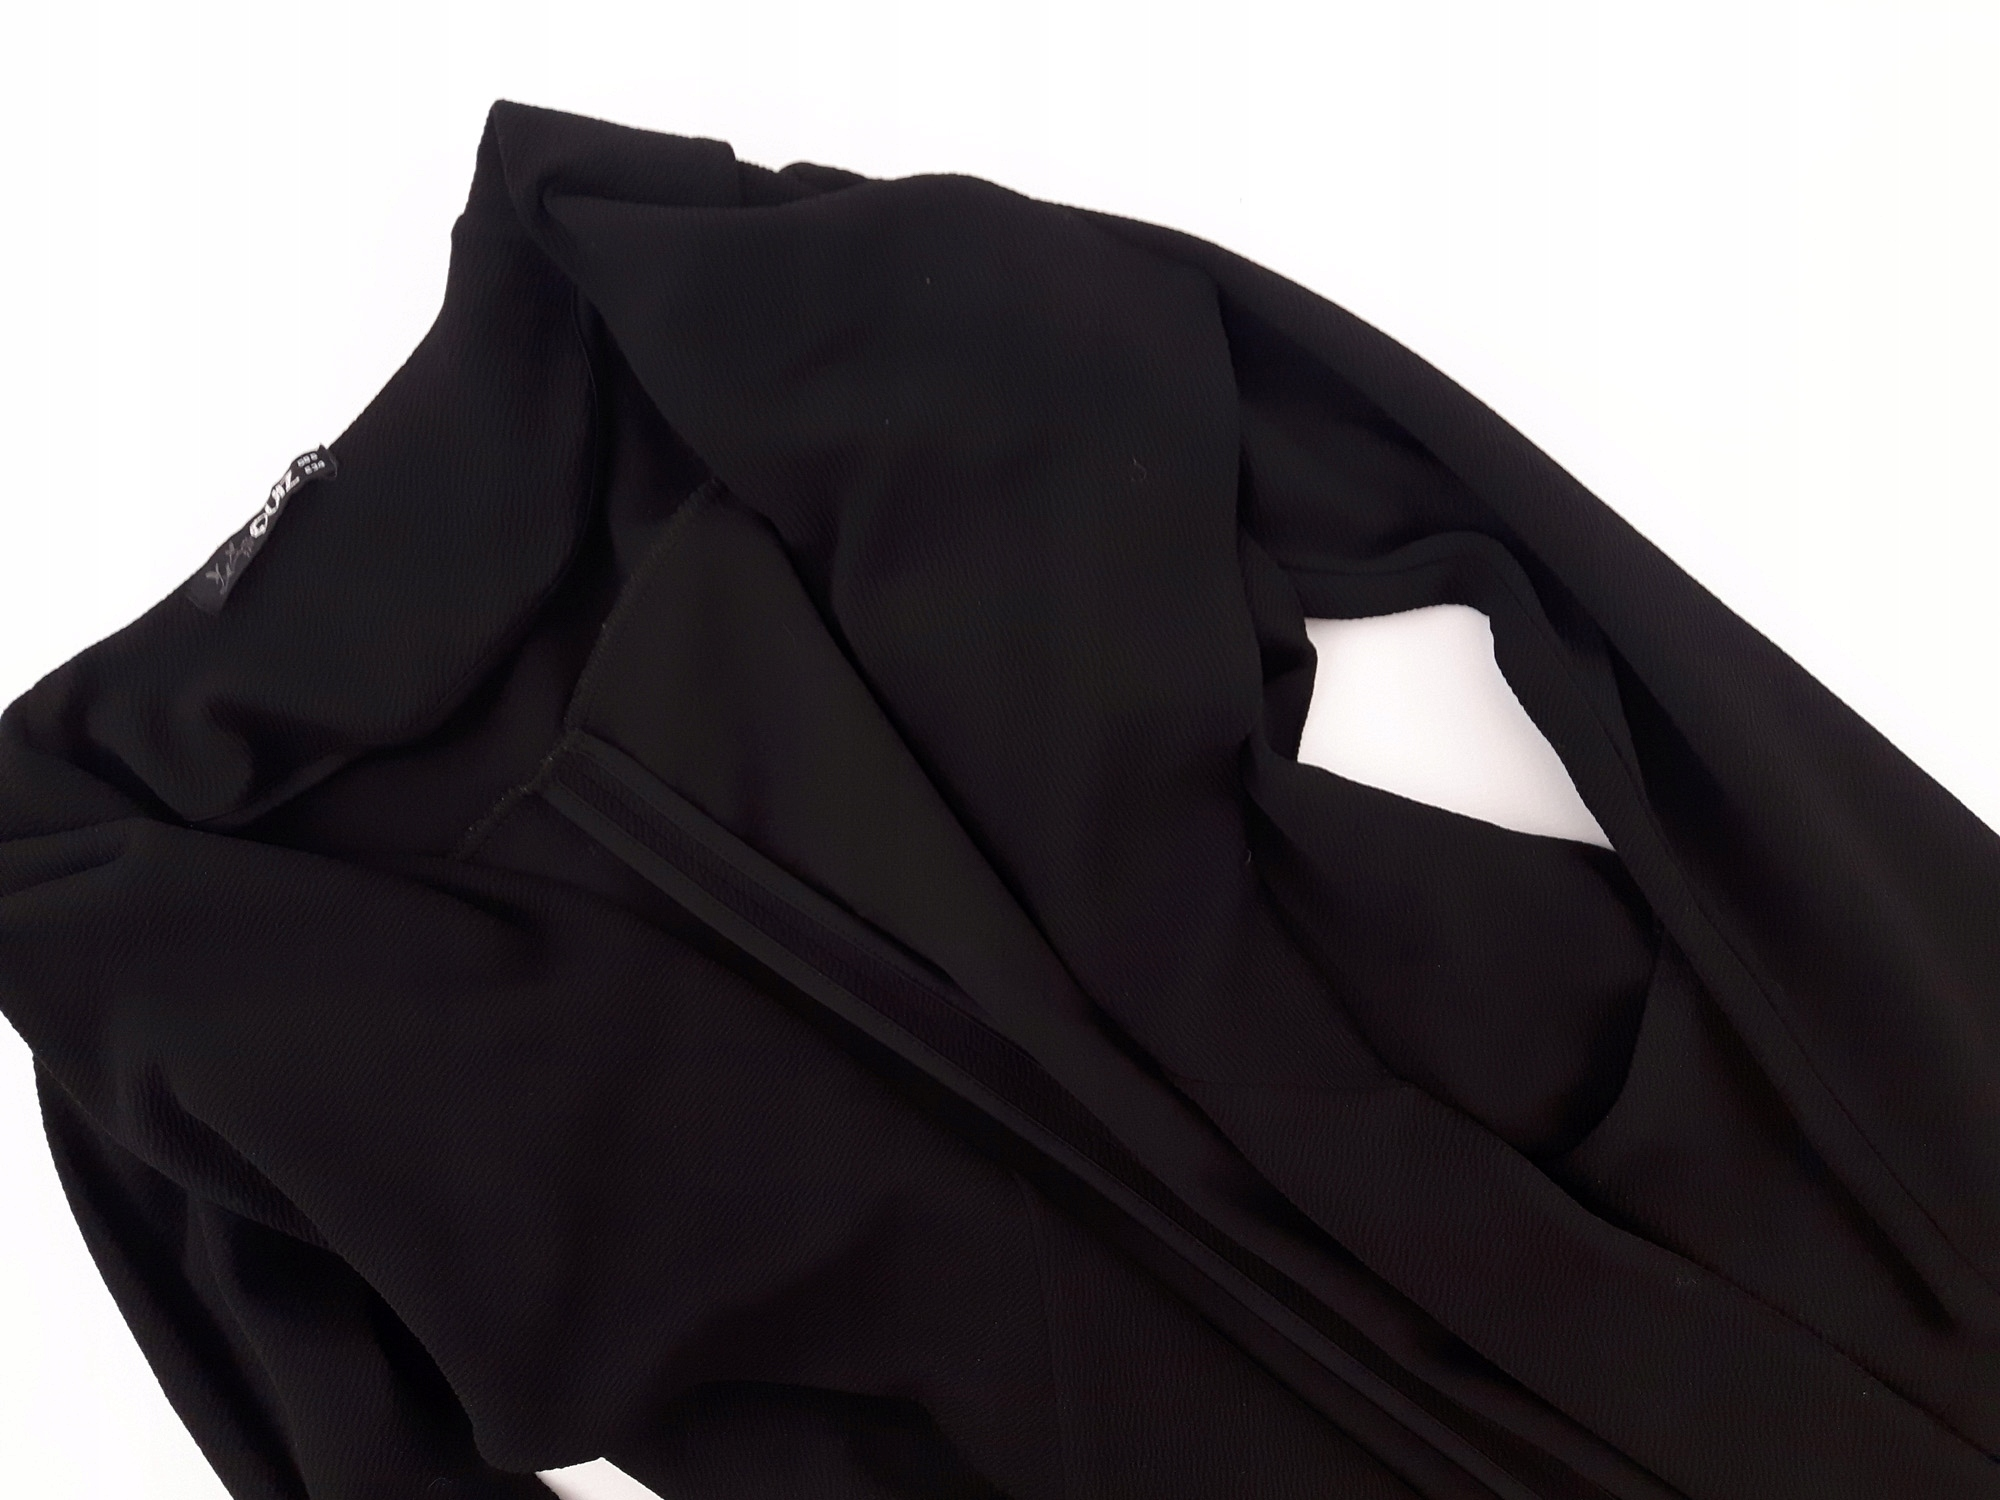 soldo czarna bluza 65zł